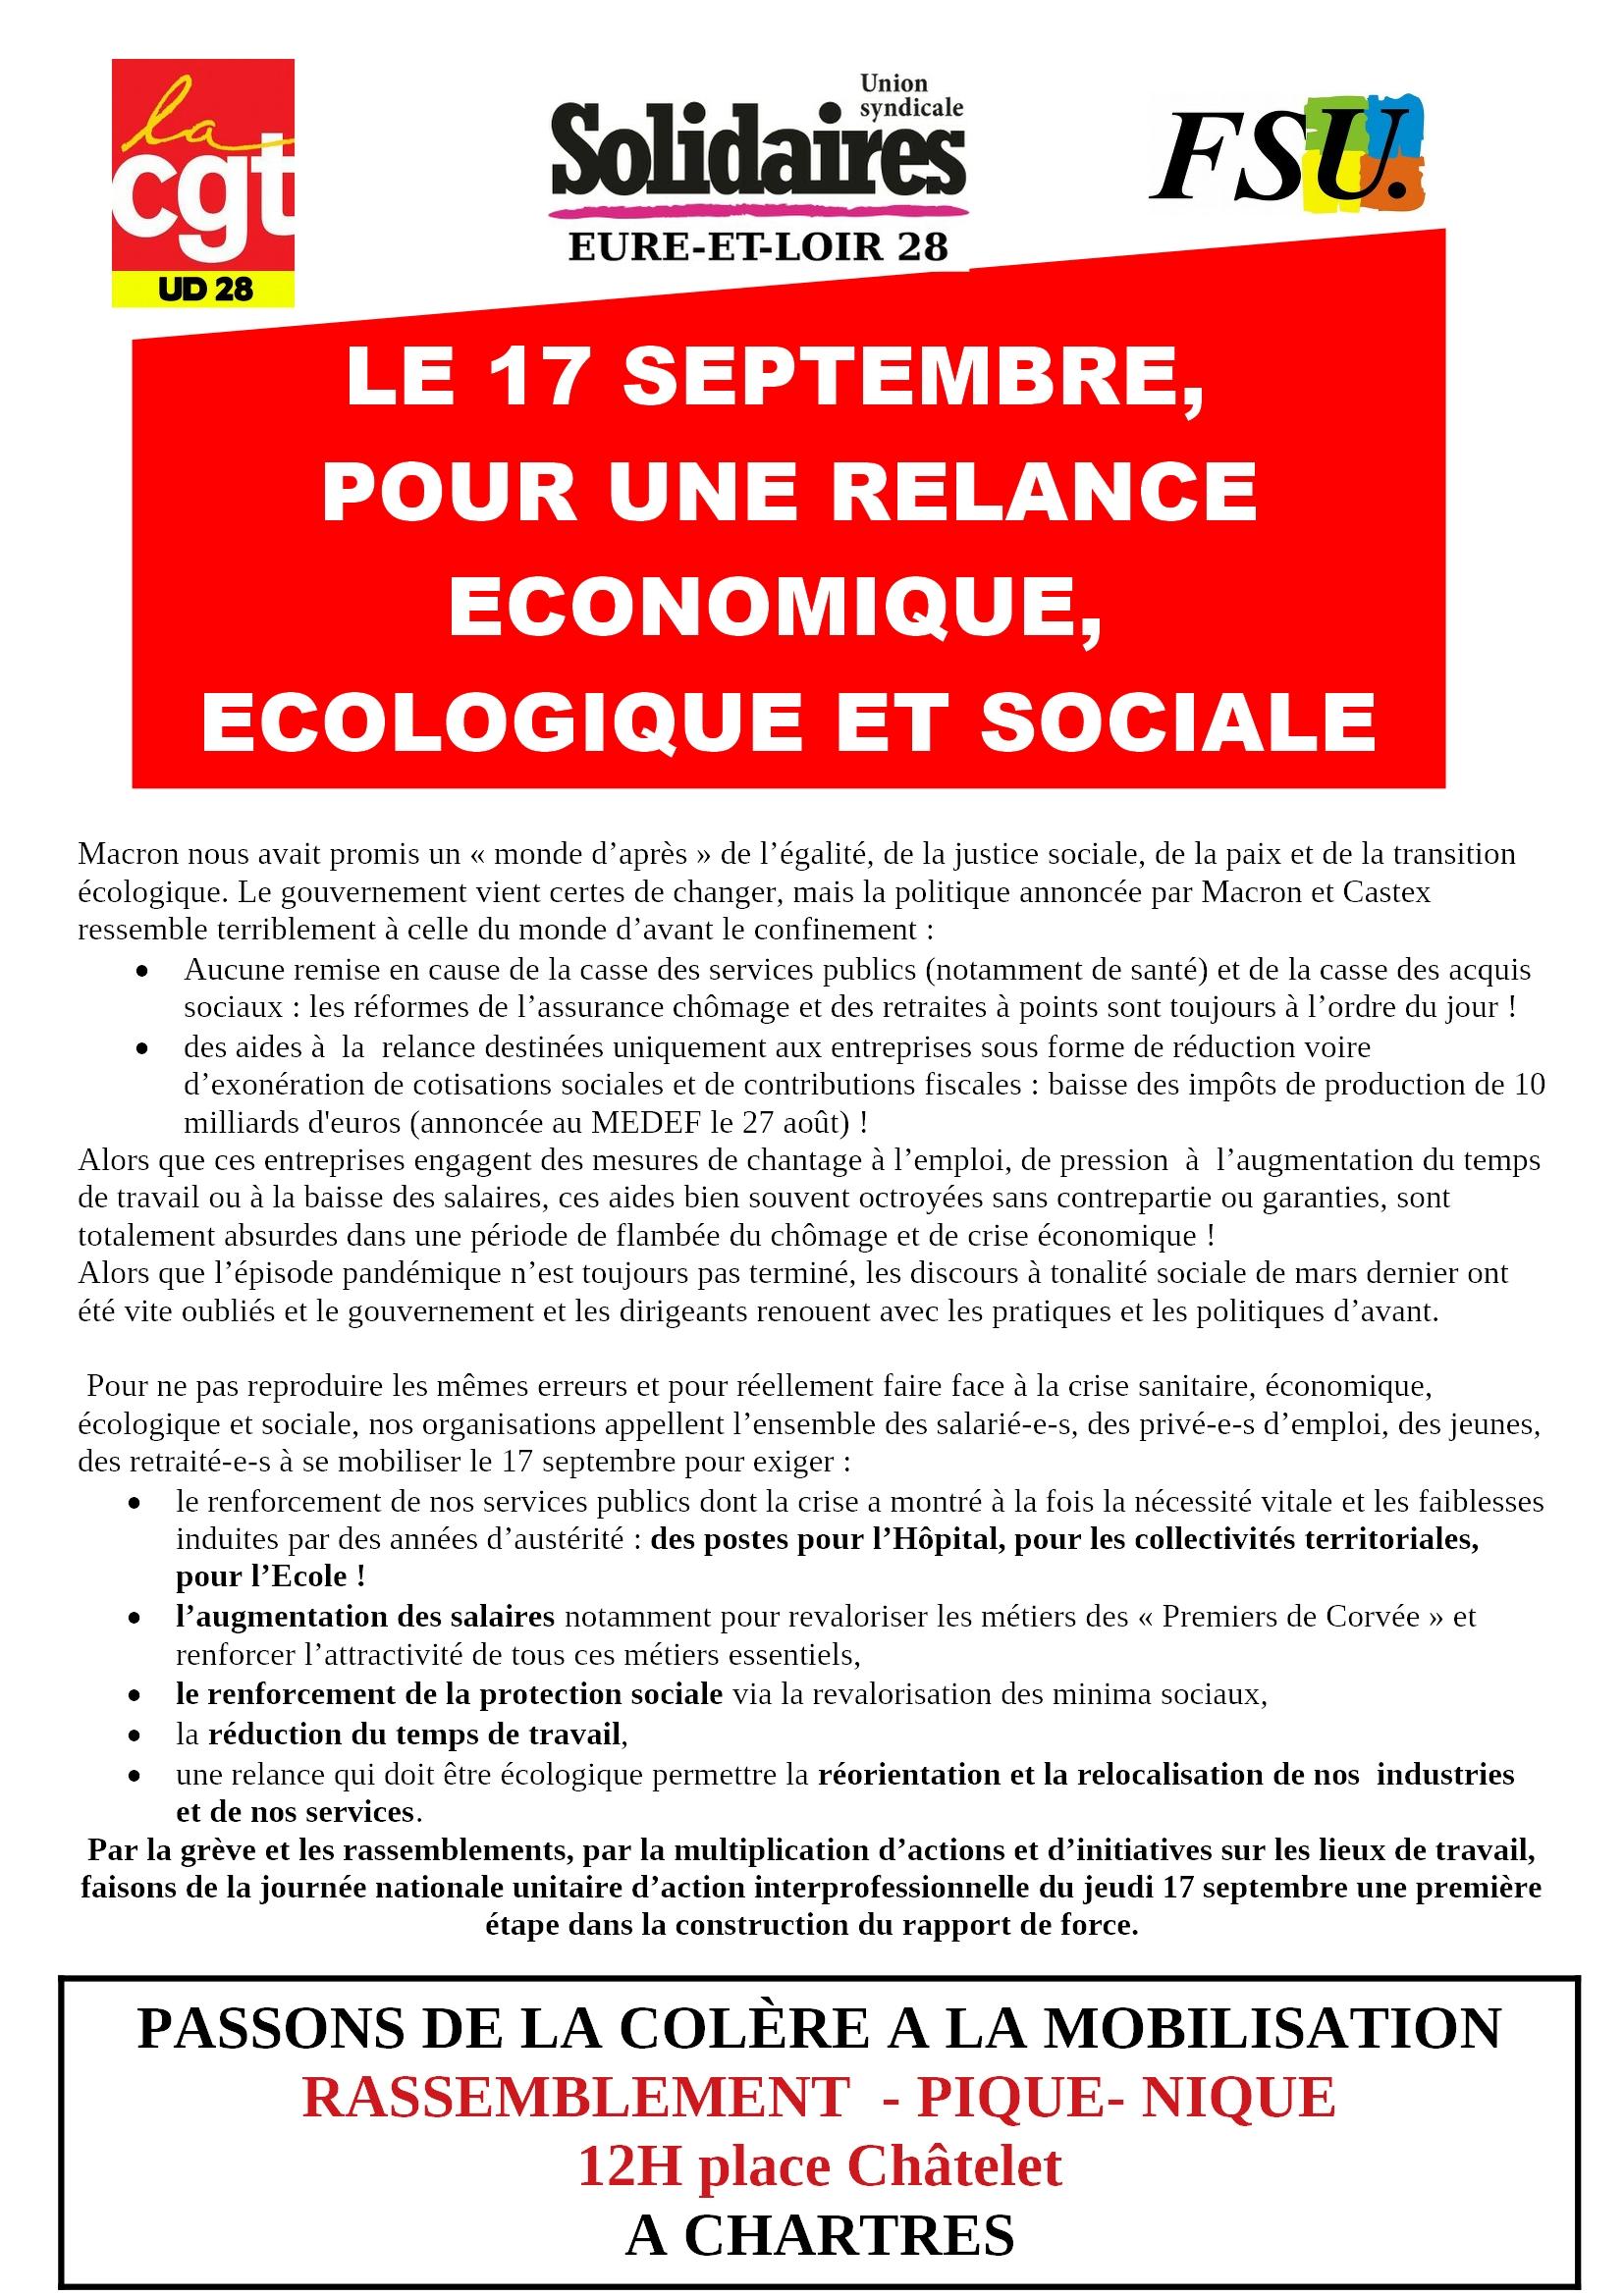 17 septembre 2020 CGT FSU Solidaires 28 Pique-nique